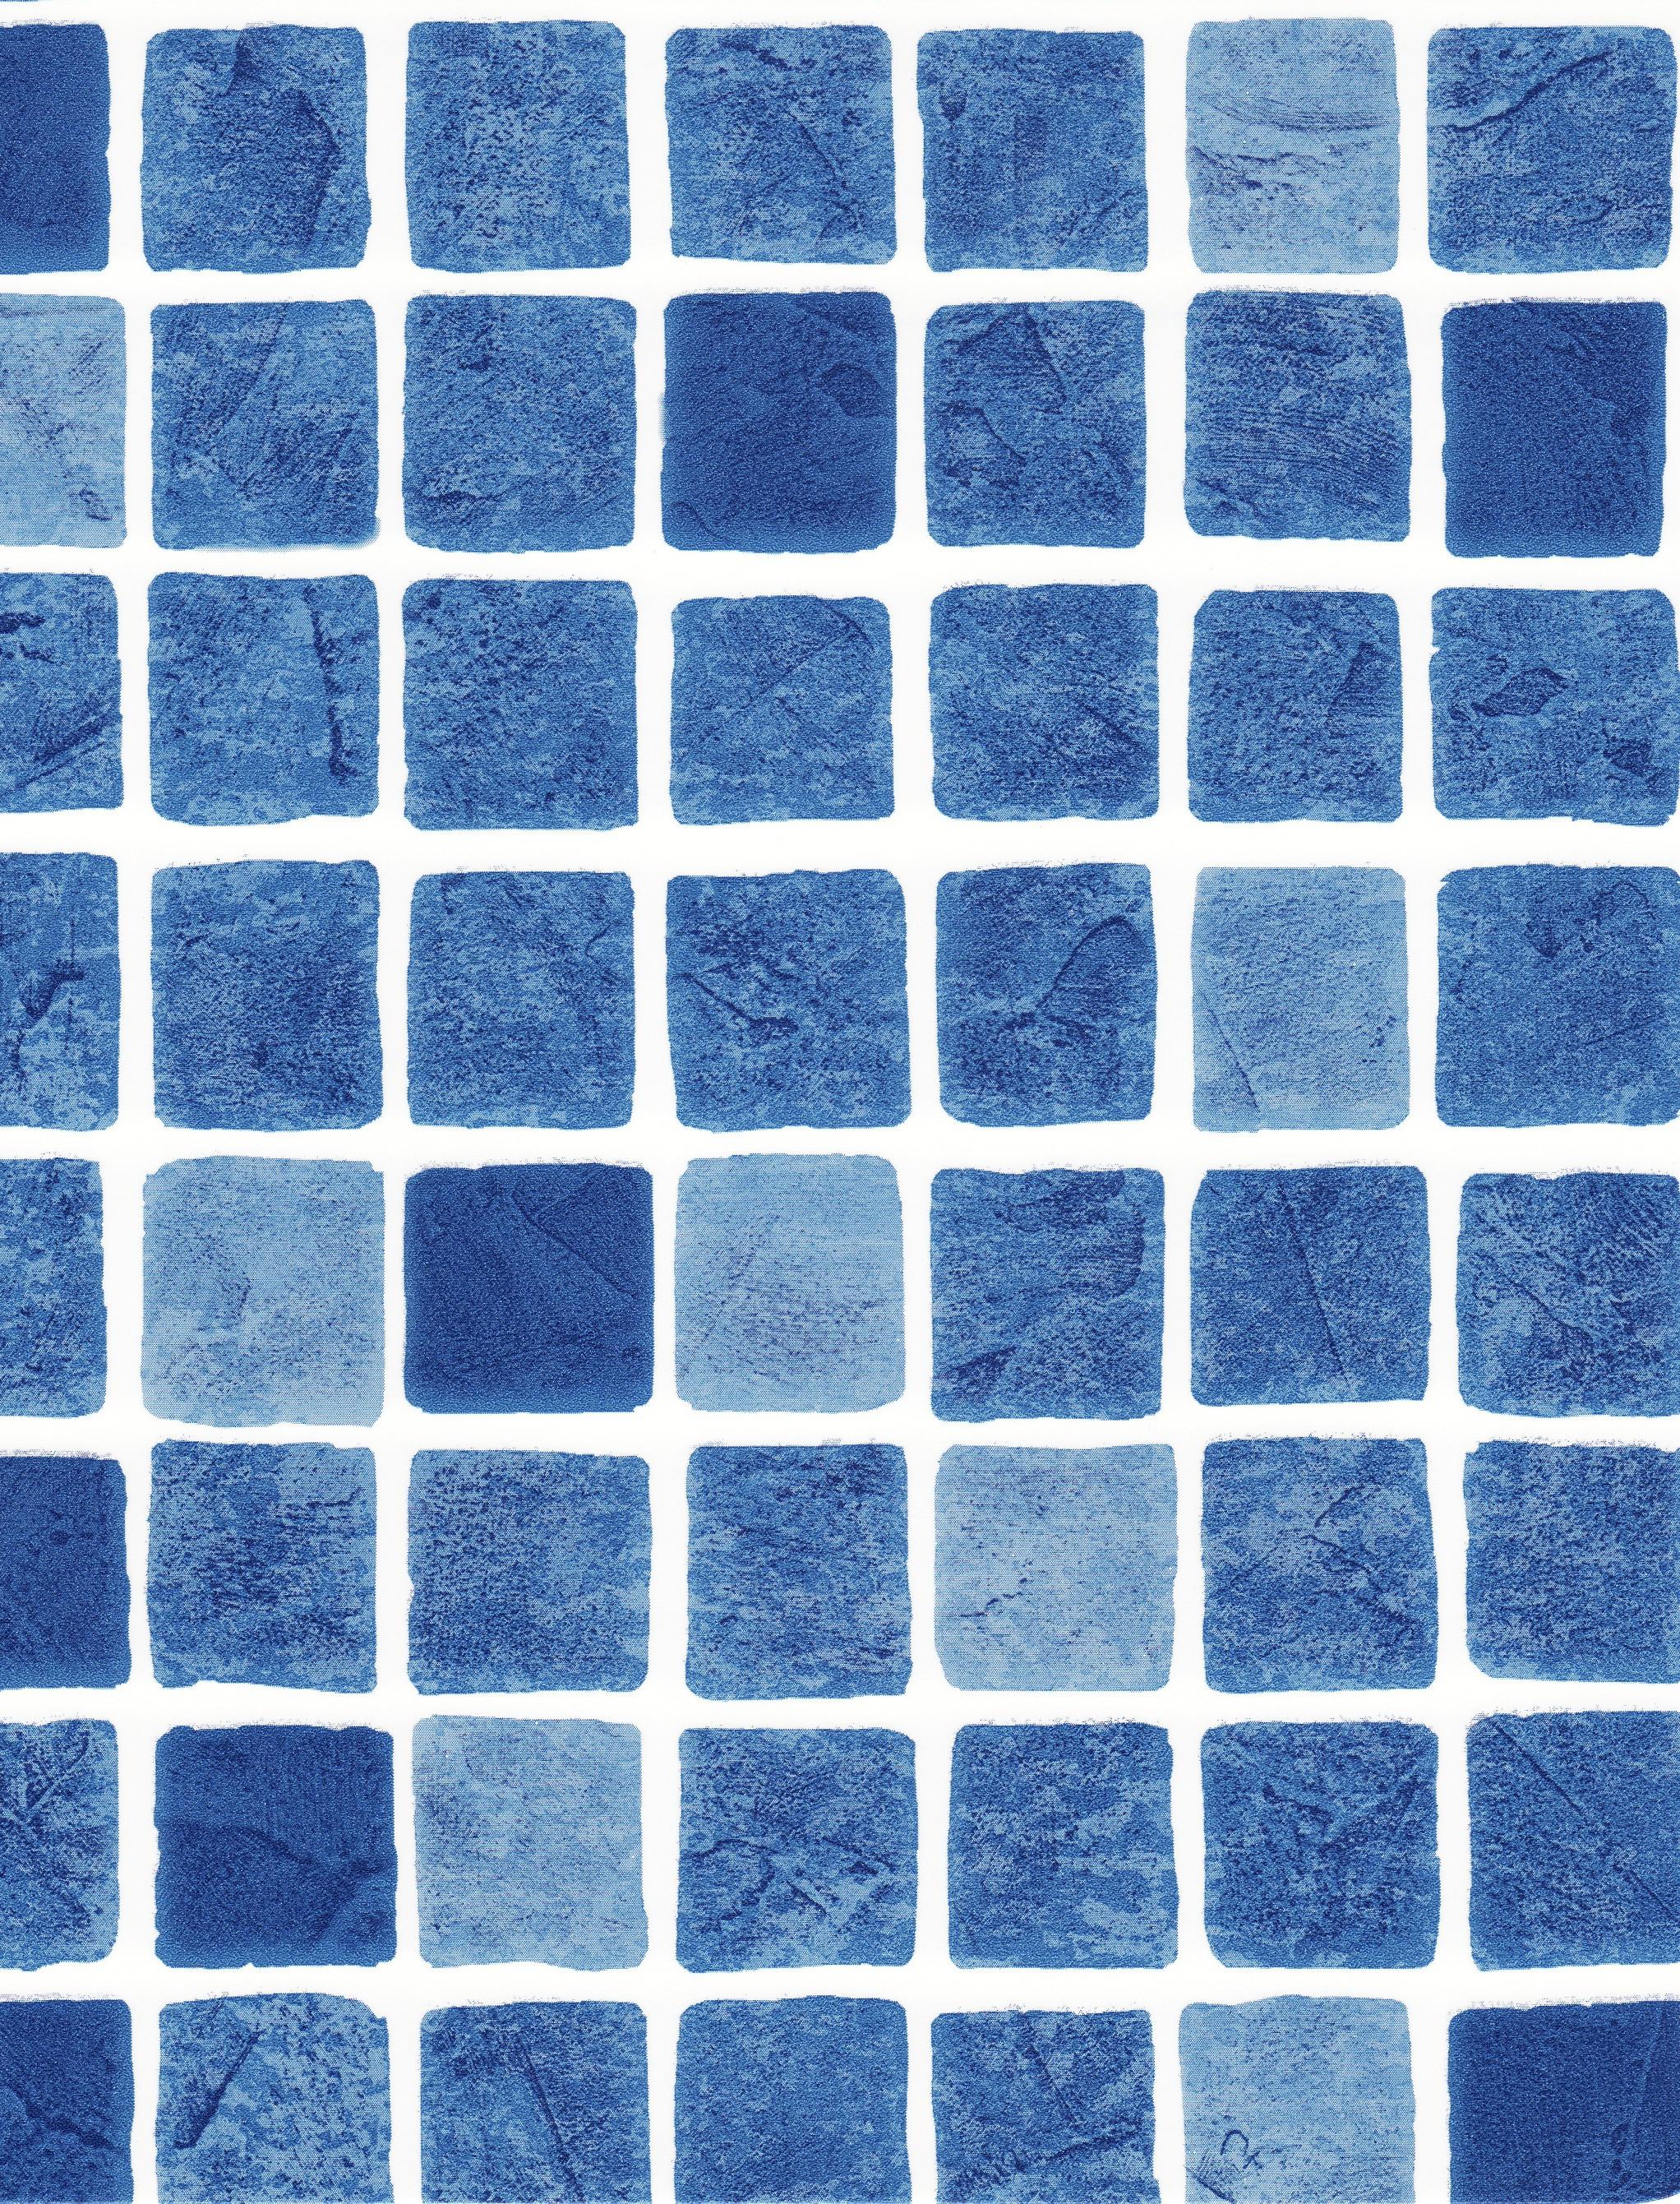 Persia Blue Mosaic